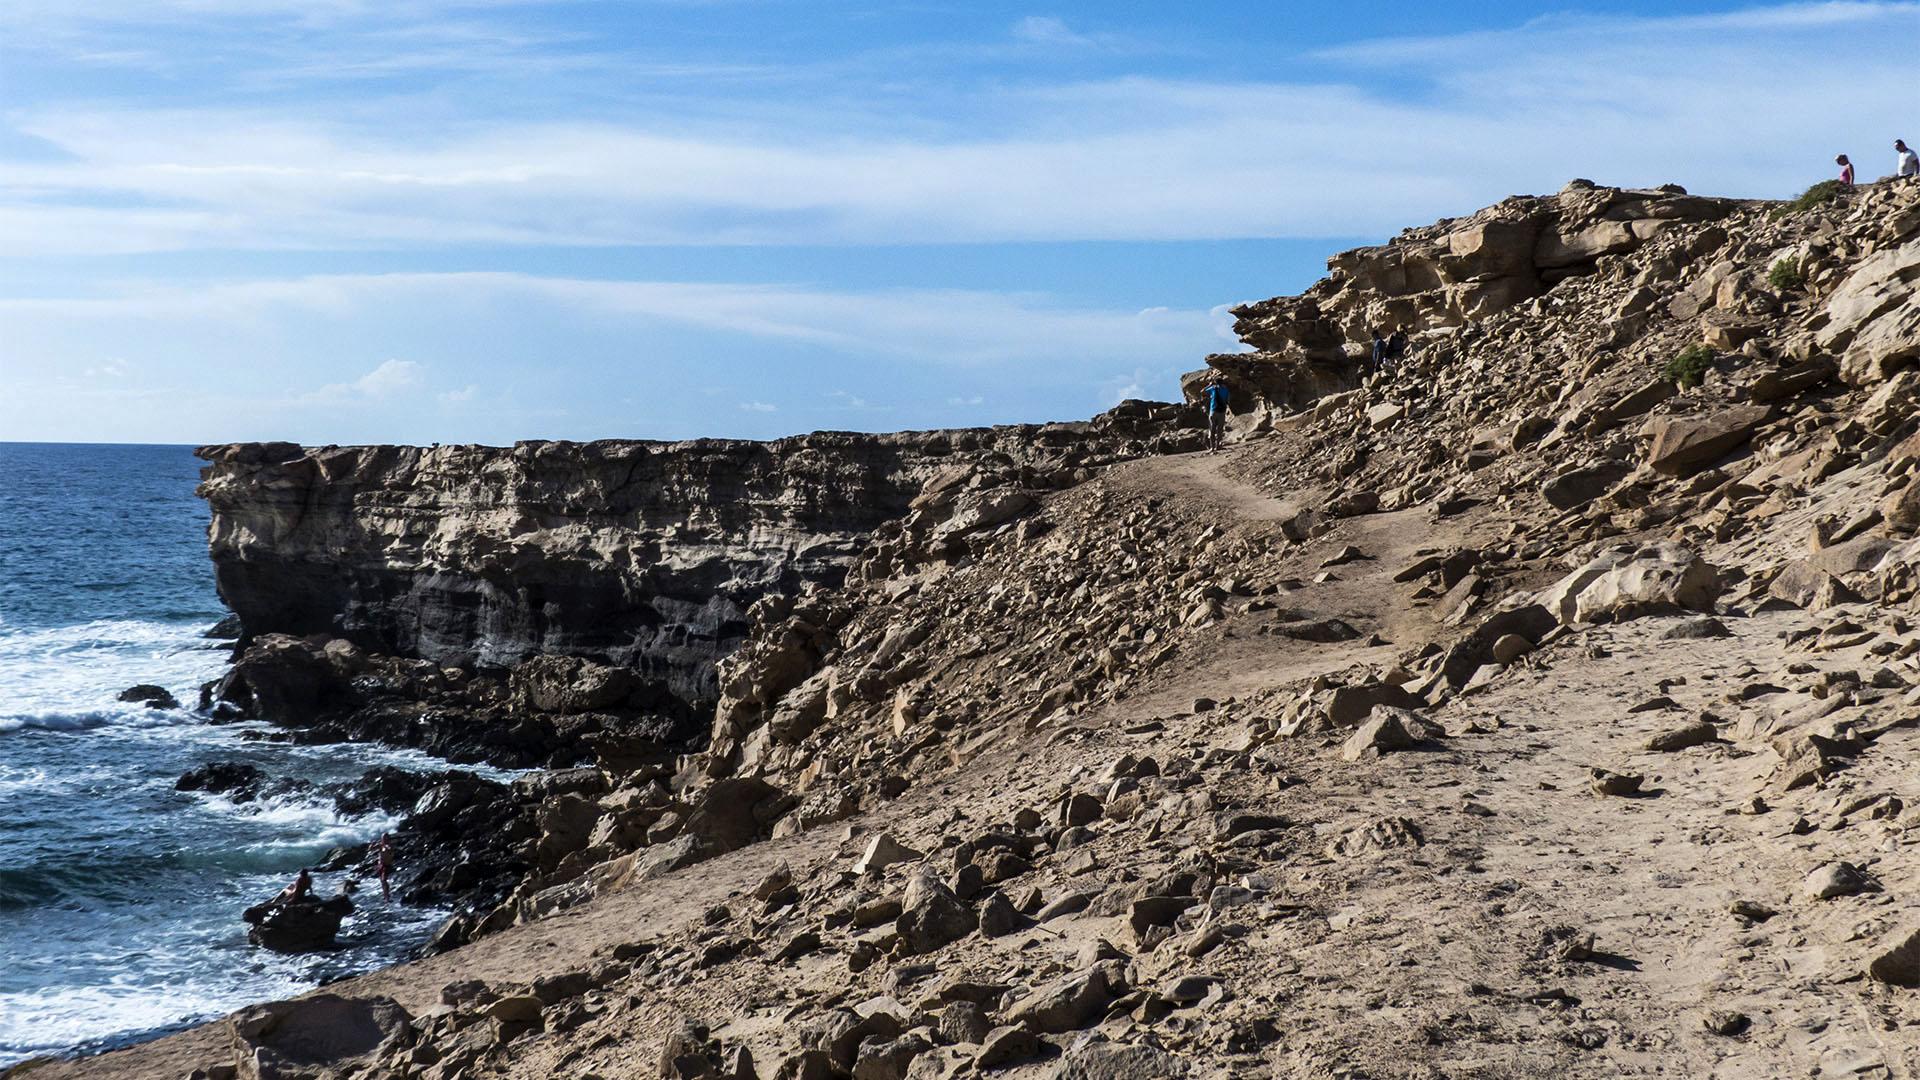 Sehenswürdigkeiten Fuerteventuras: La Pared – Punta de Guadalupe